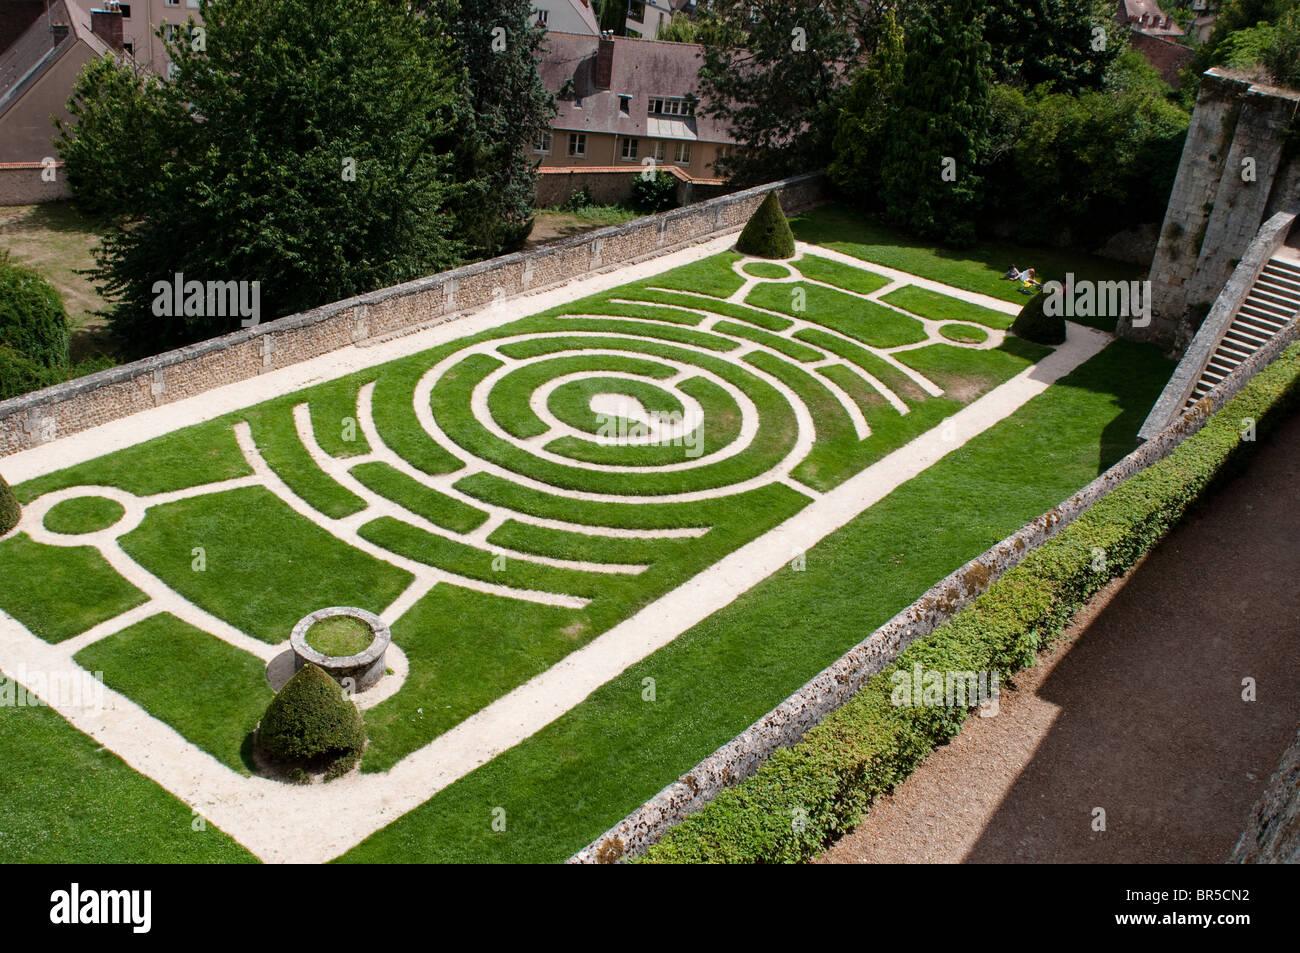 Flower Garden Designs Labyrinth Html on